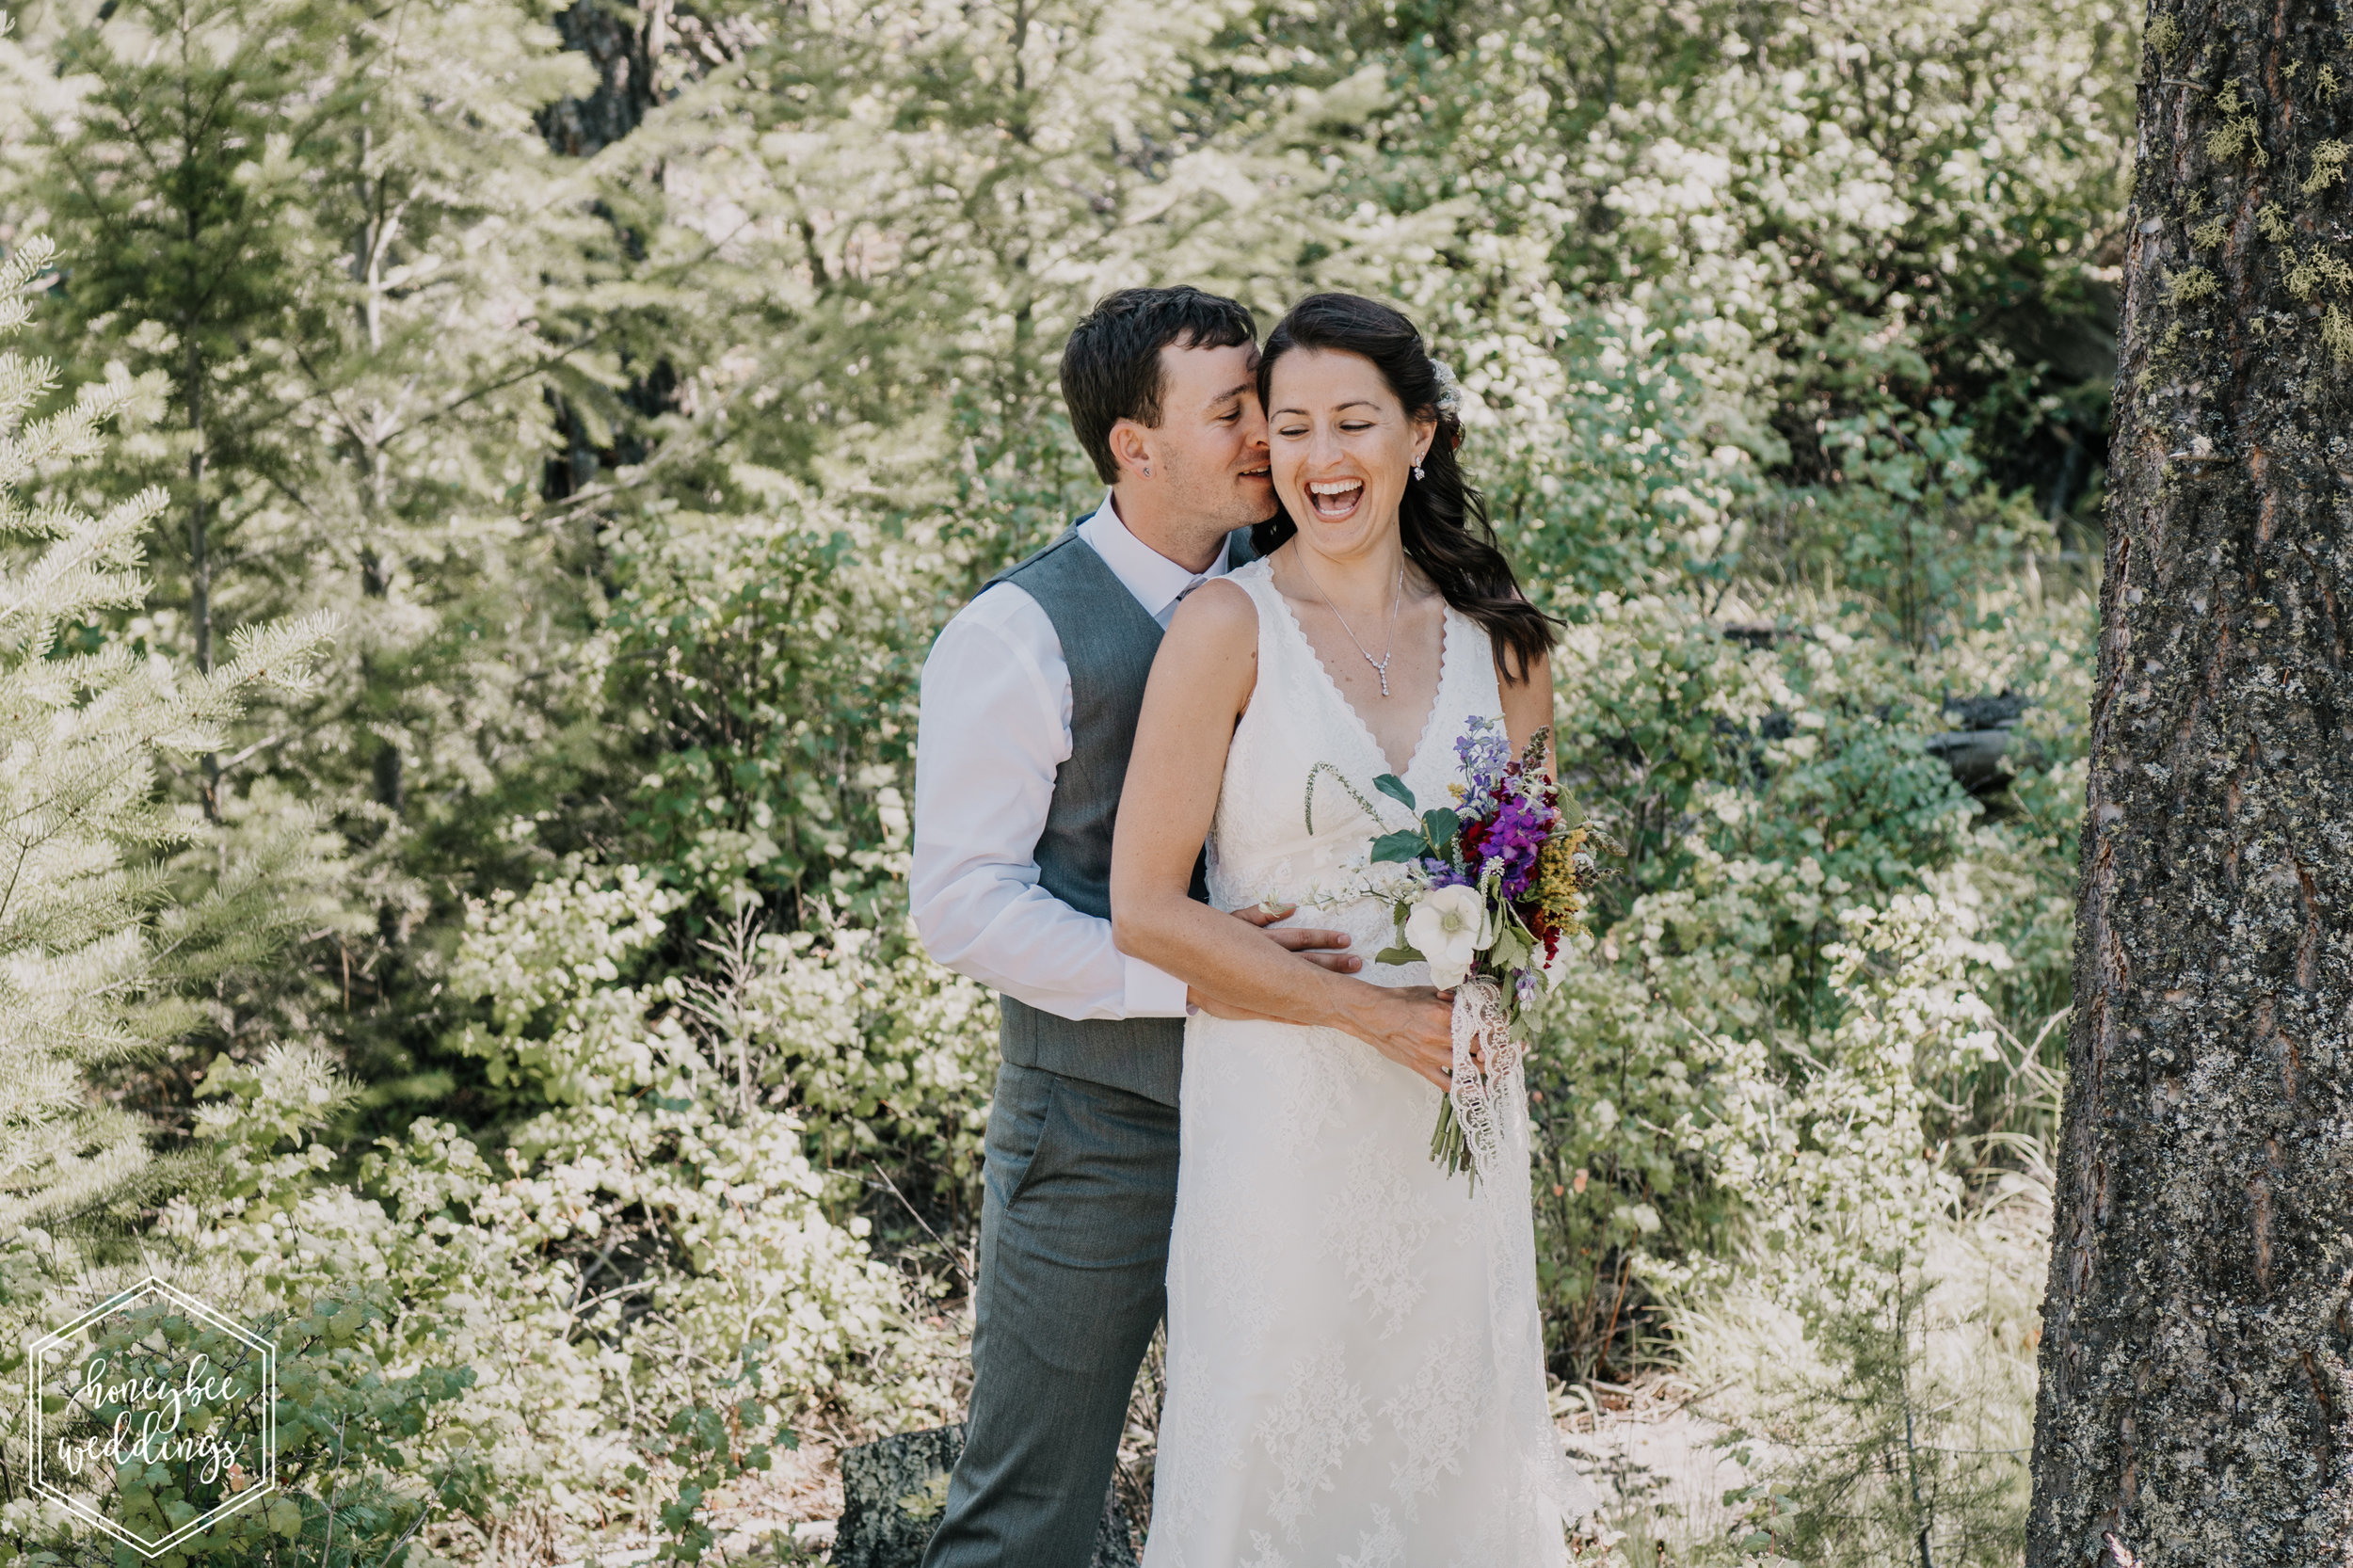 230 White Raven Wedding_Montana Wedding Photographer_Honeybee Weddings_ Meghan Maloney + Arza Hammond 2018-9314-2.jpg